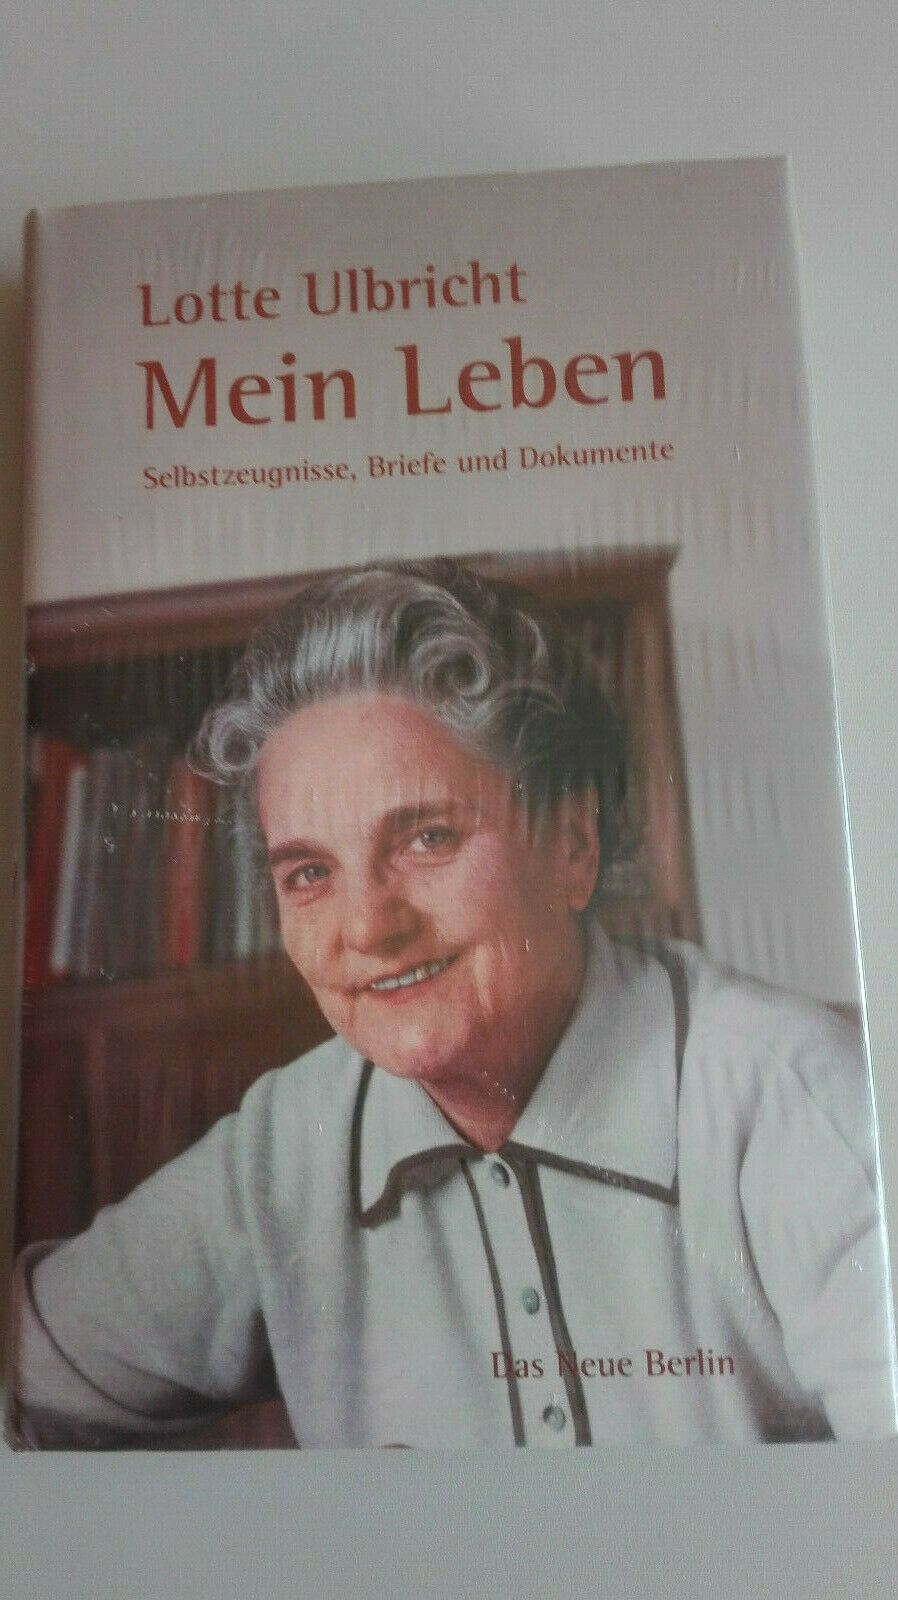 Mein Leben - Lotte Ulbricht - Lotte Ulbricht